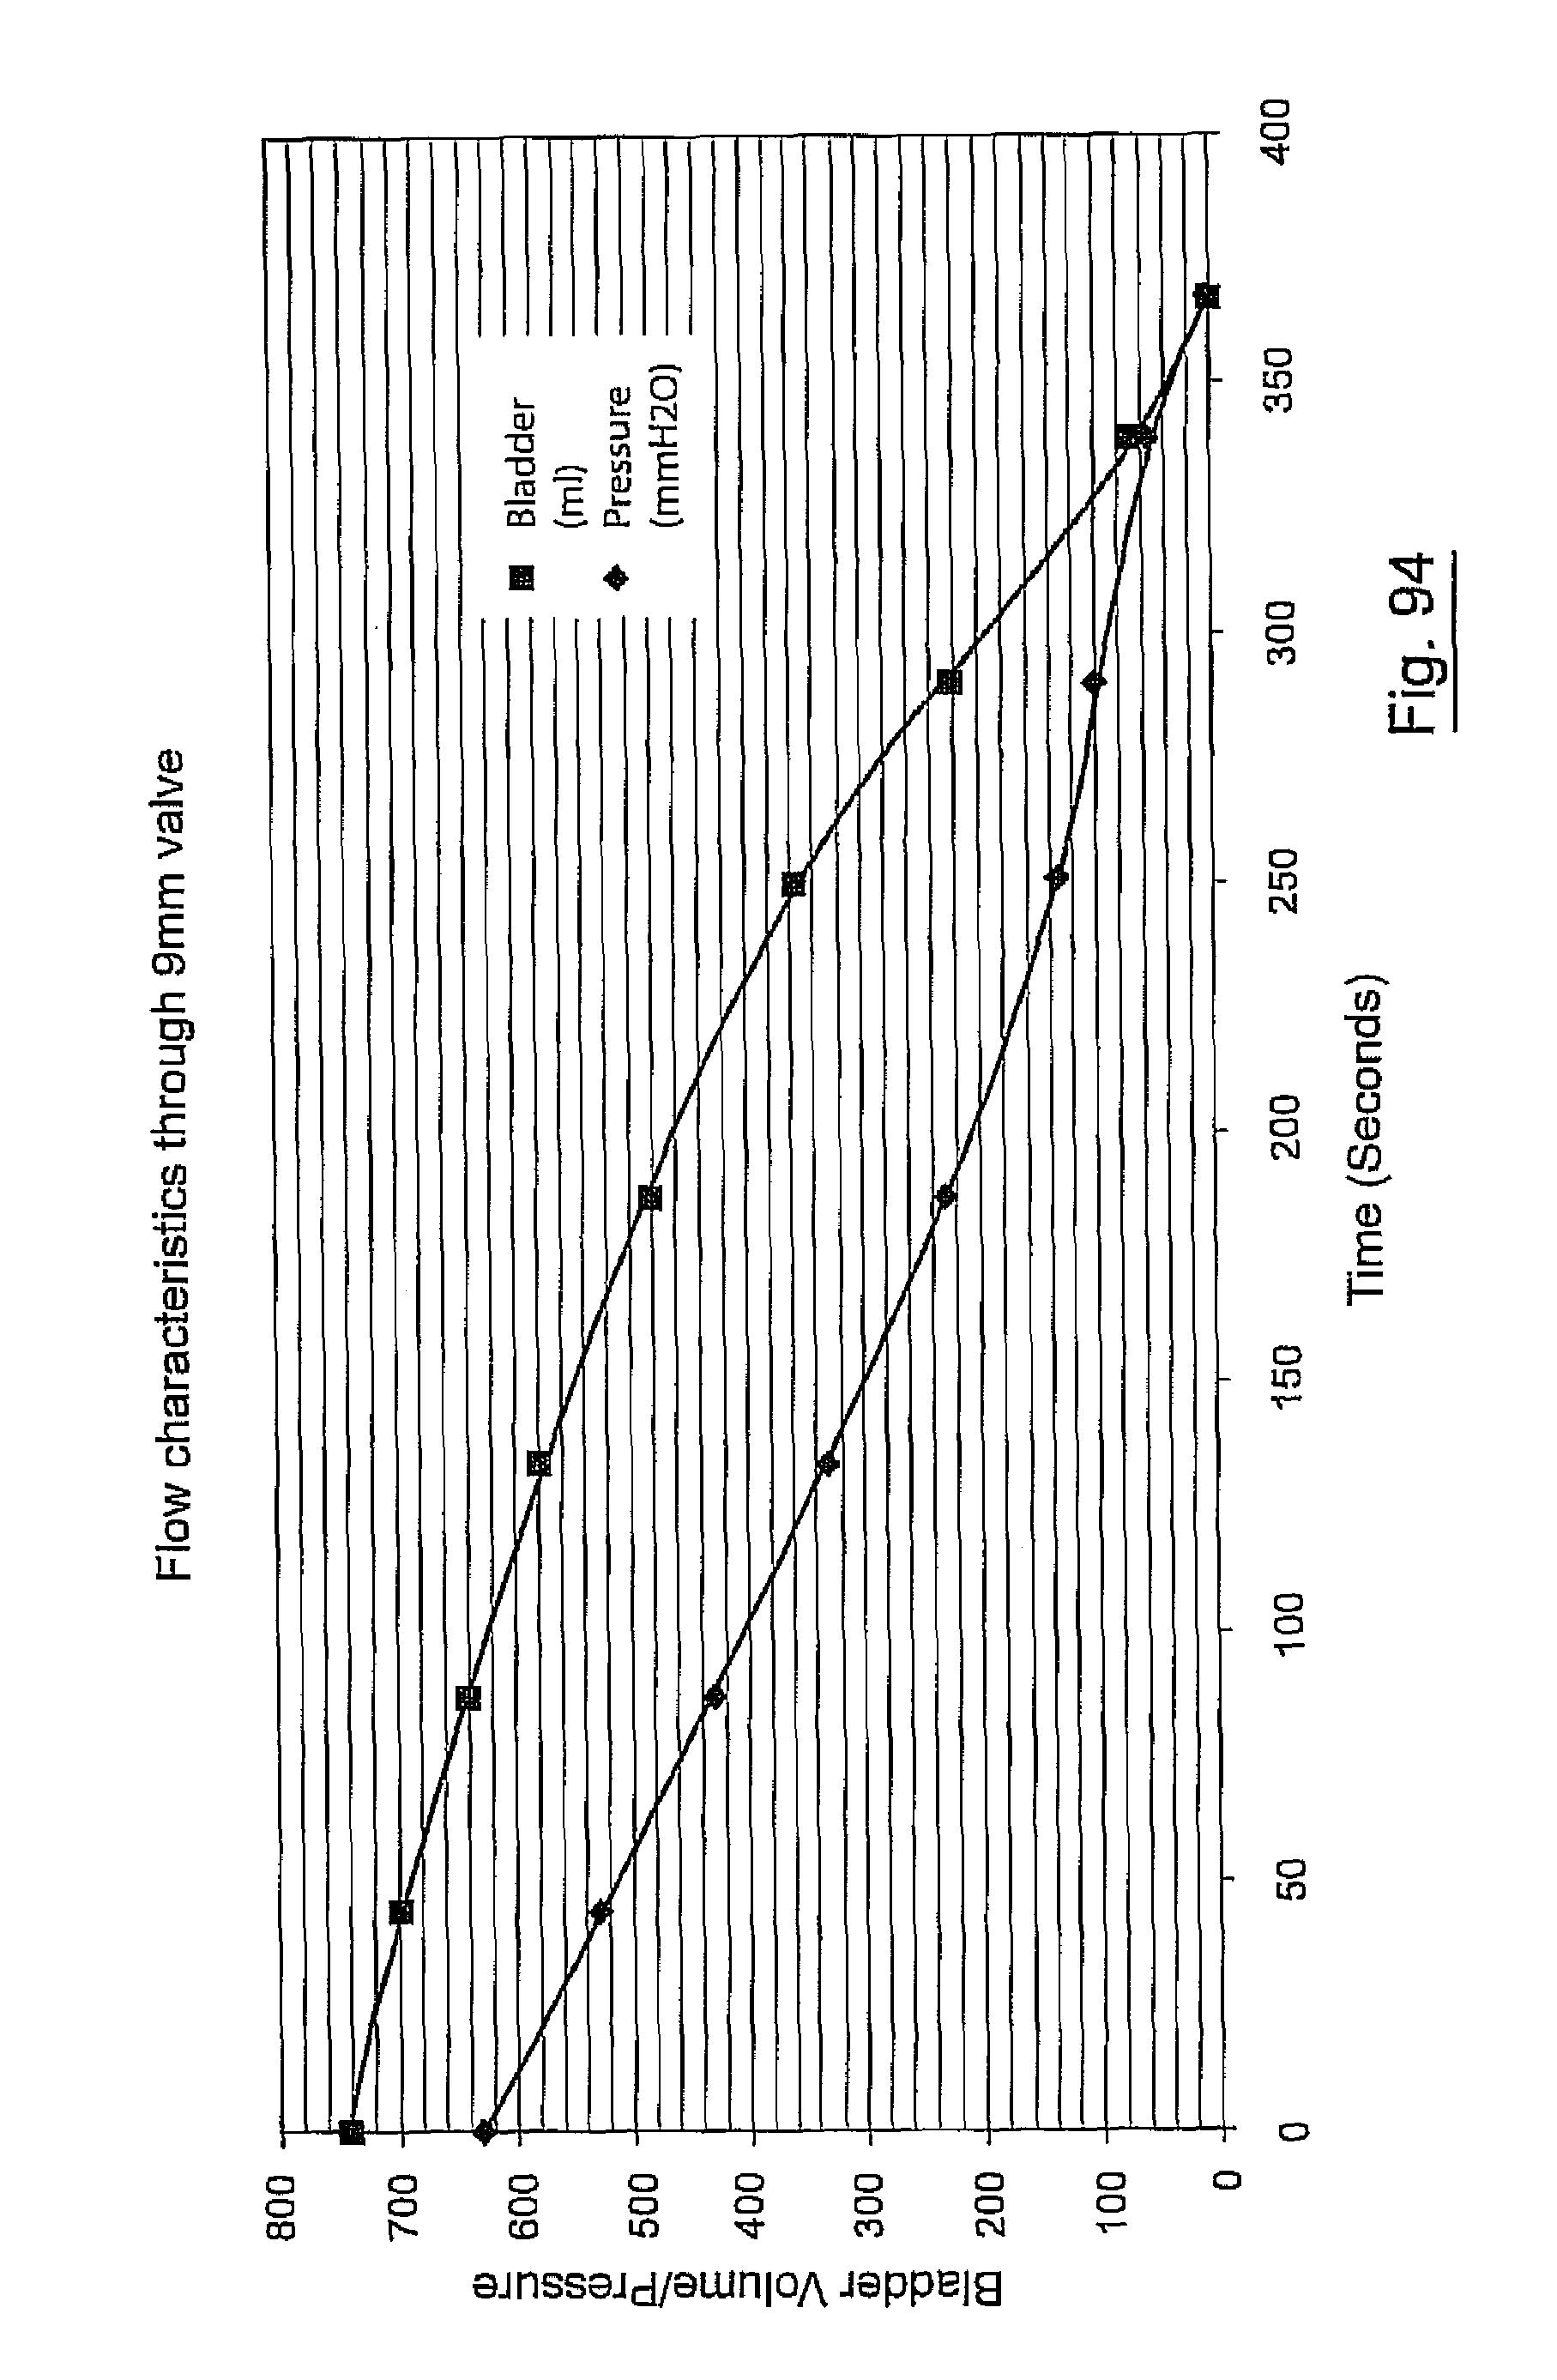 US8876800B2 - Urological device - Google Patents